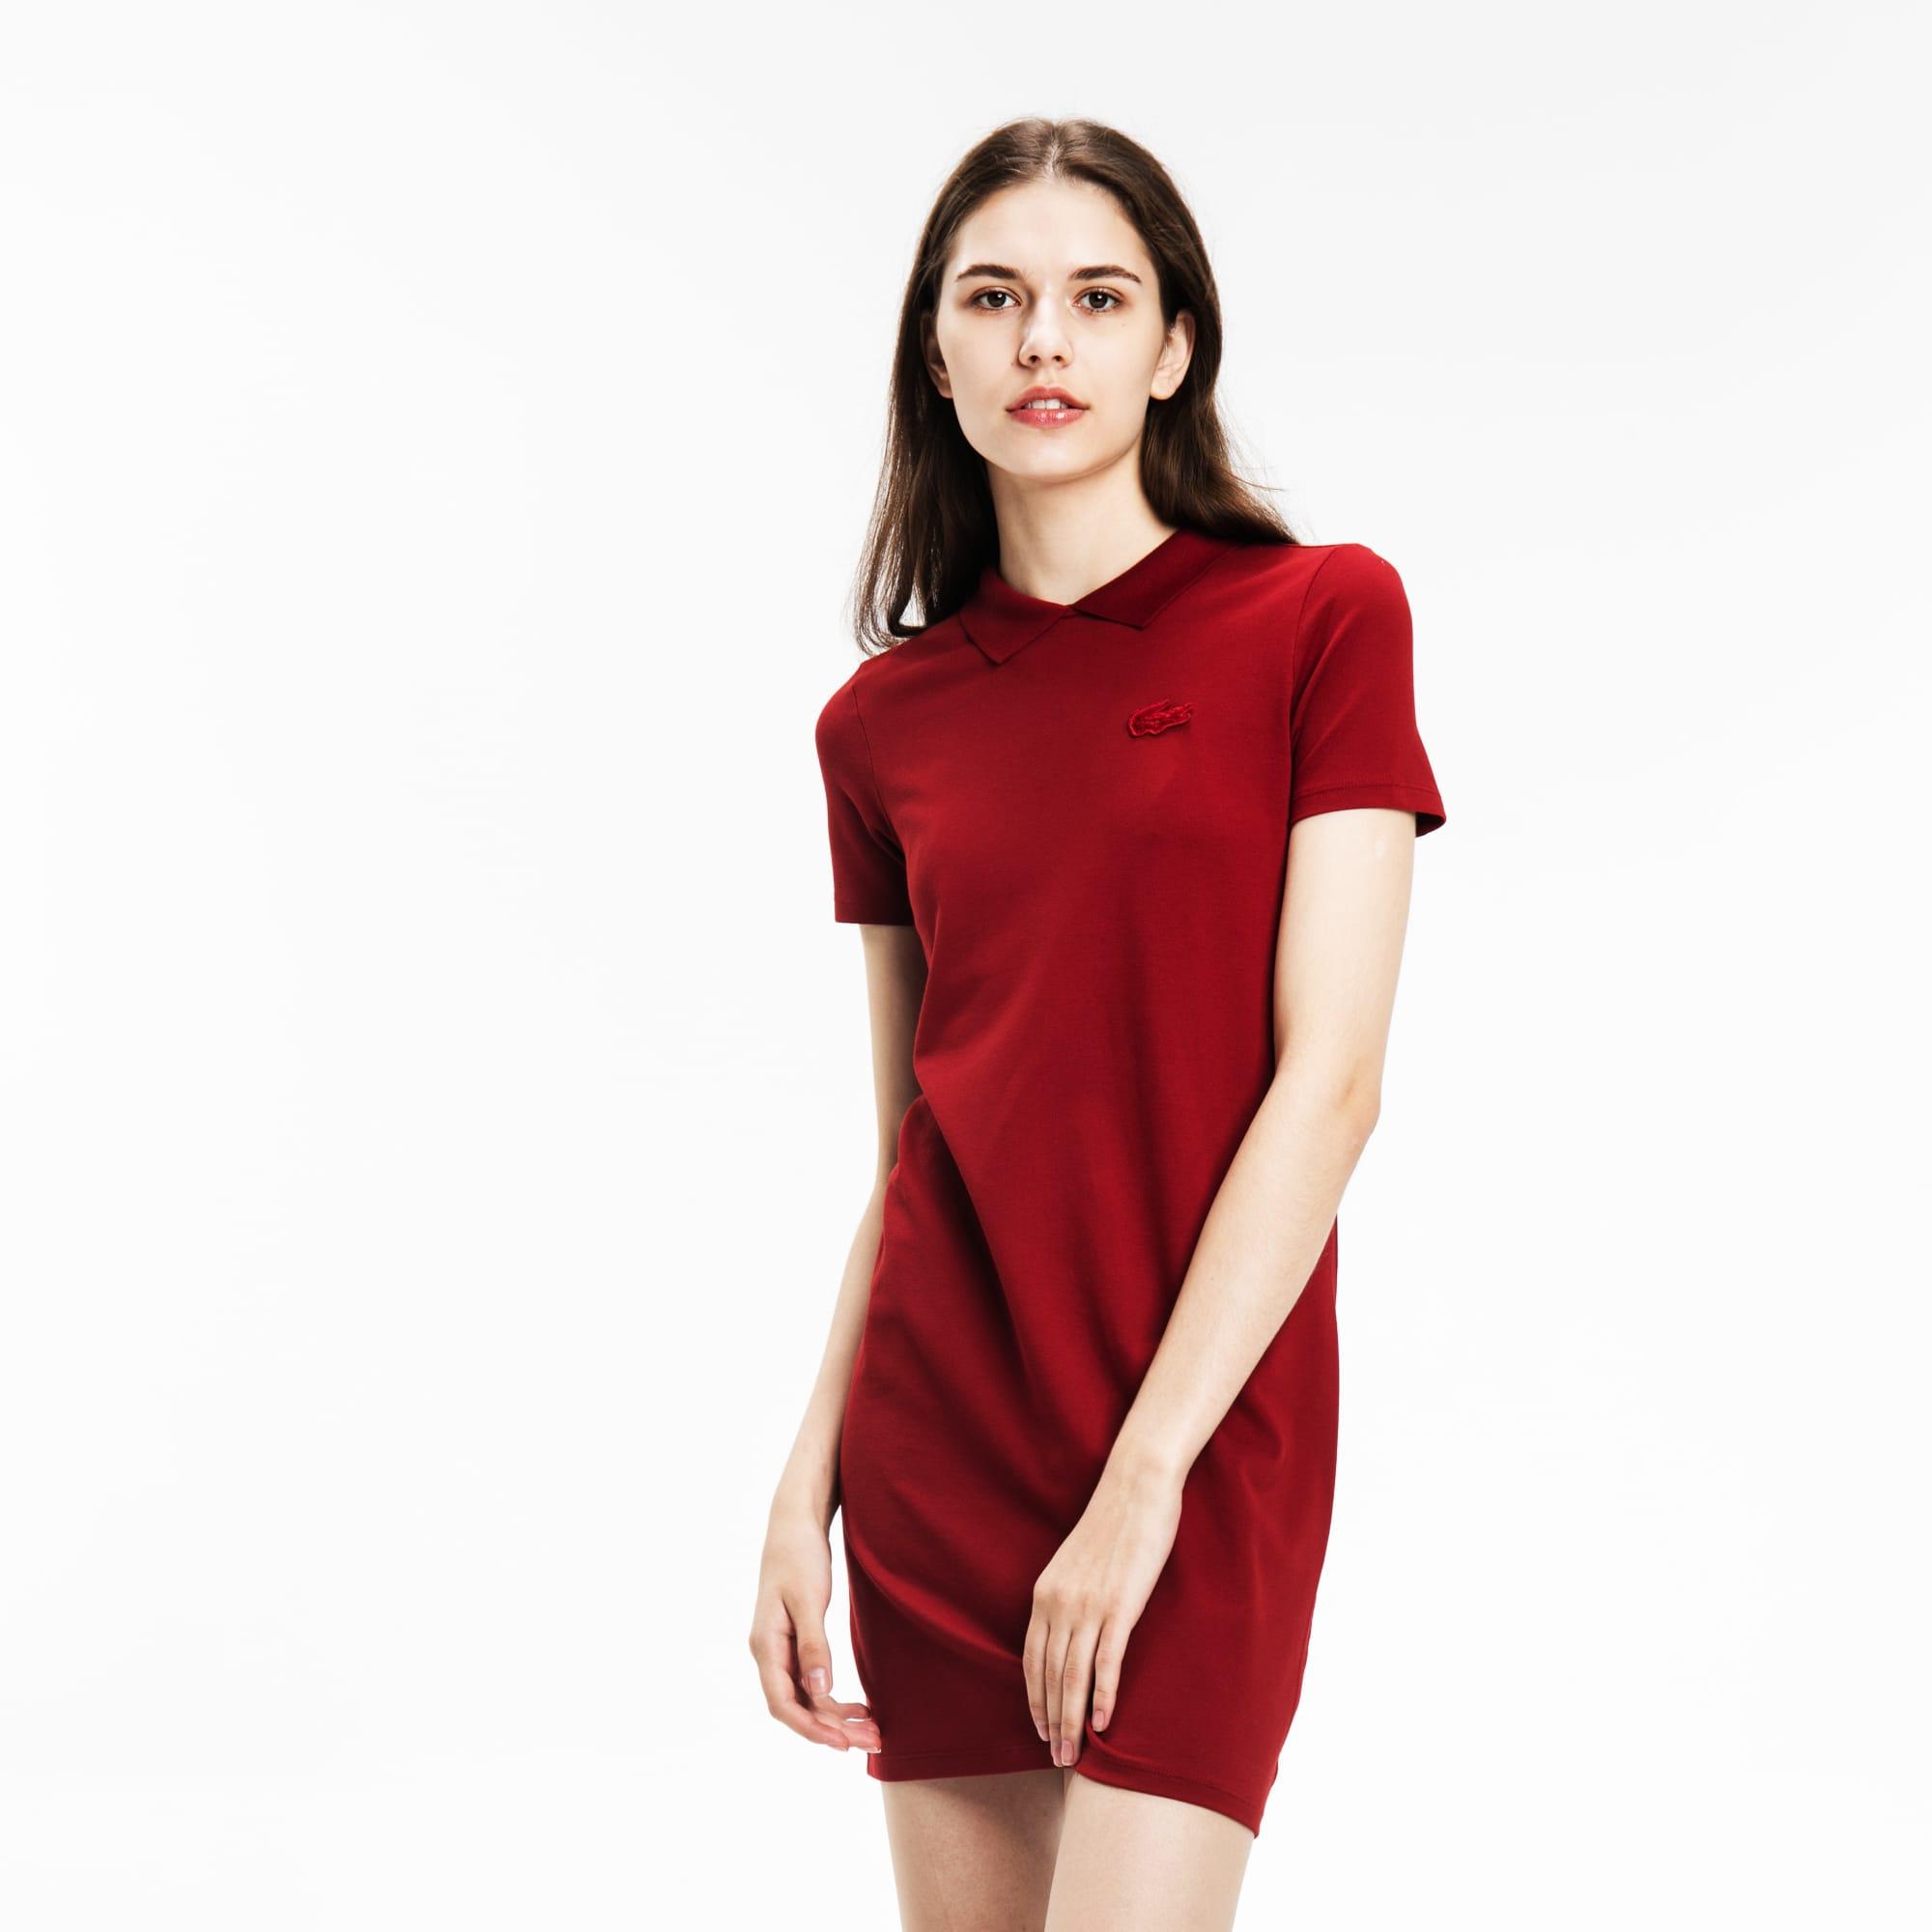 Lacoste LIVE系列女士背部开口设计弹性迷你凸纹网眼面料Polo裙